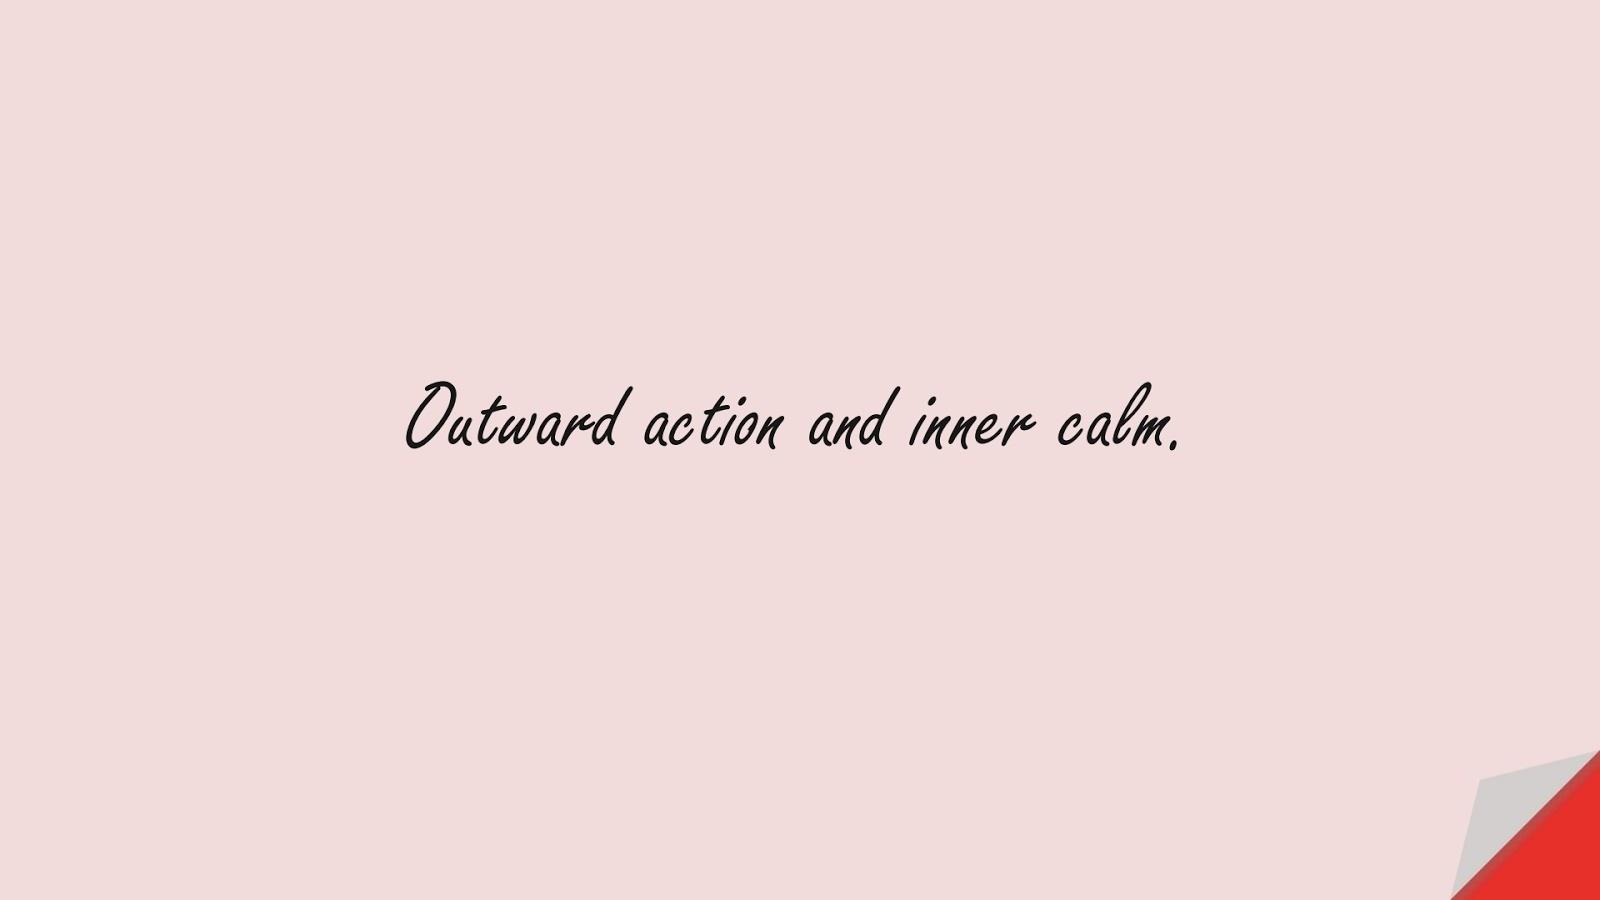 Outward action and inner calm.FALSE